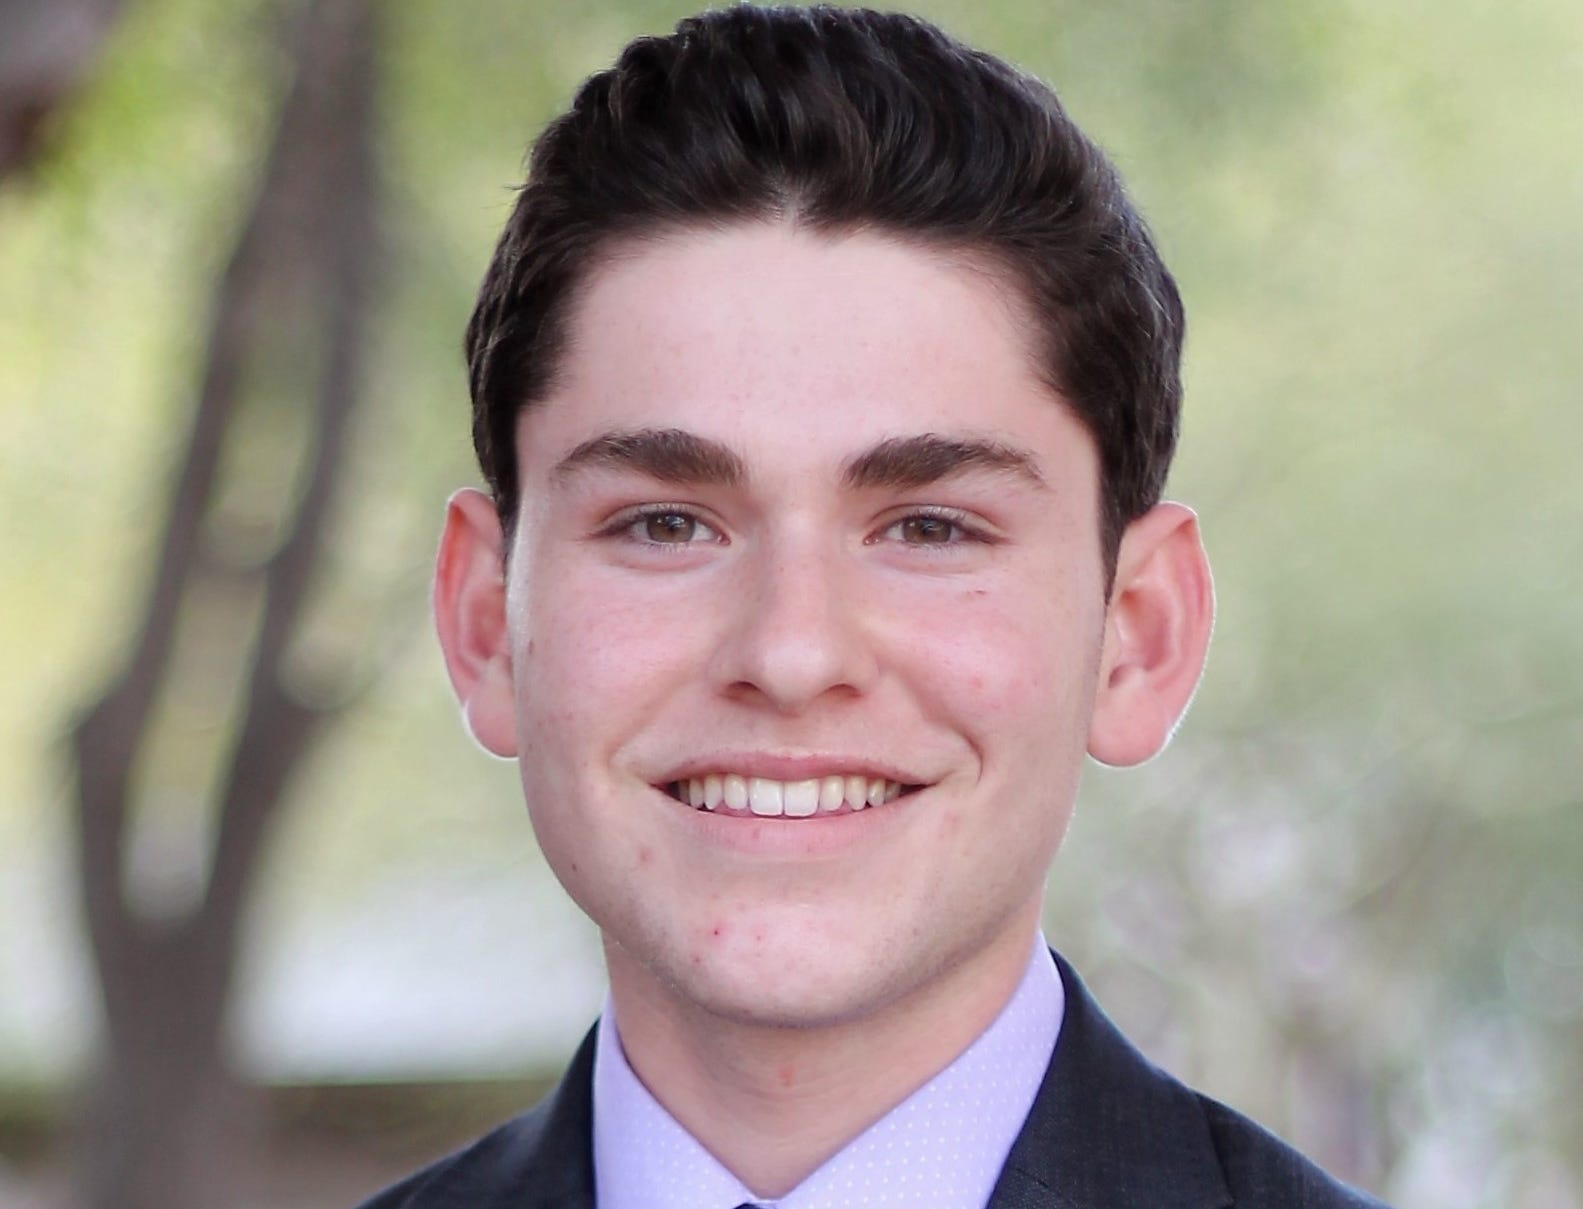 Kyle Polen, Chaparral High School in Scottsdale.